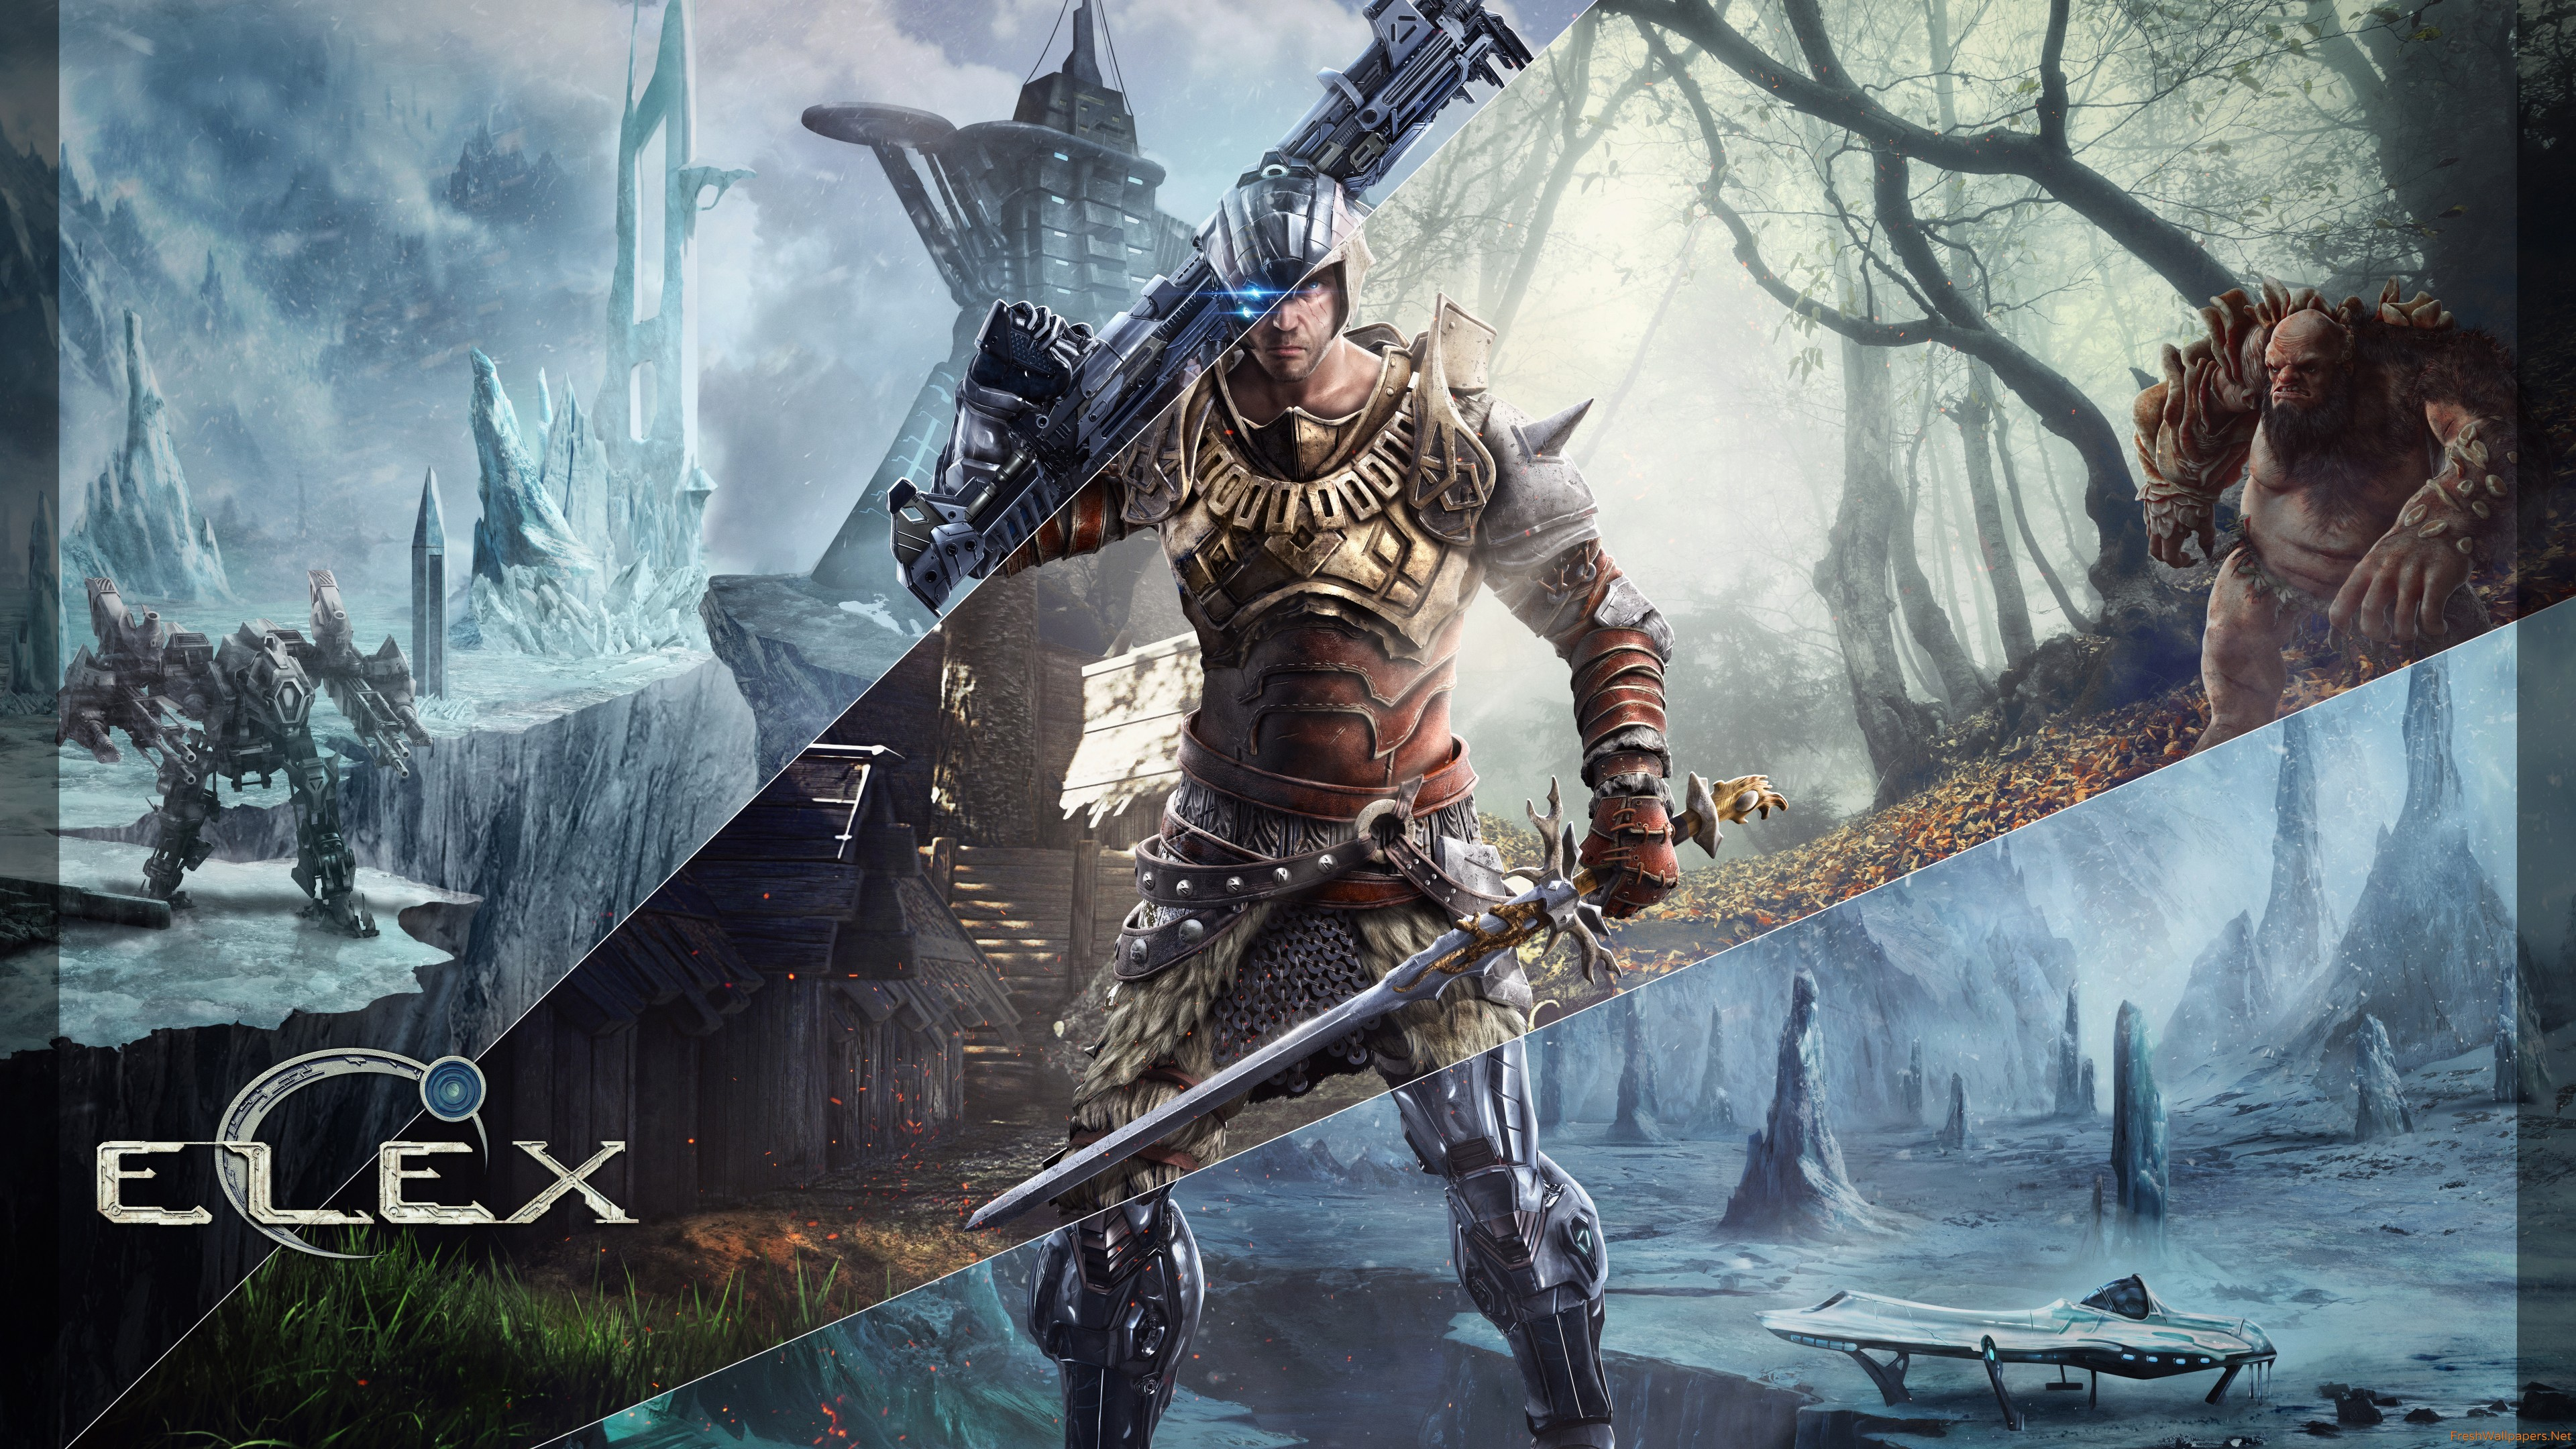 Hd 16 - - Sword And Gun Warrior , HD Wallpaper & Backgrounds